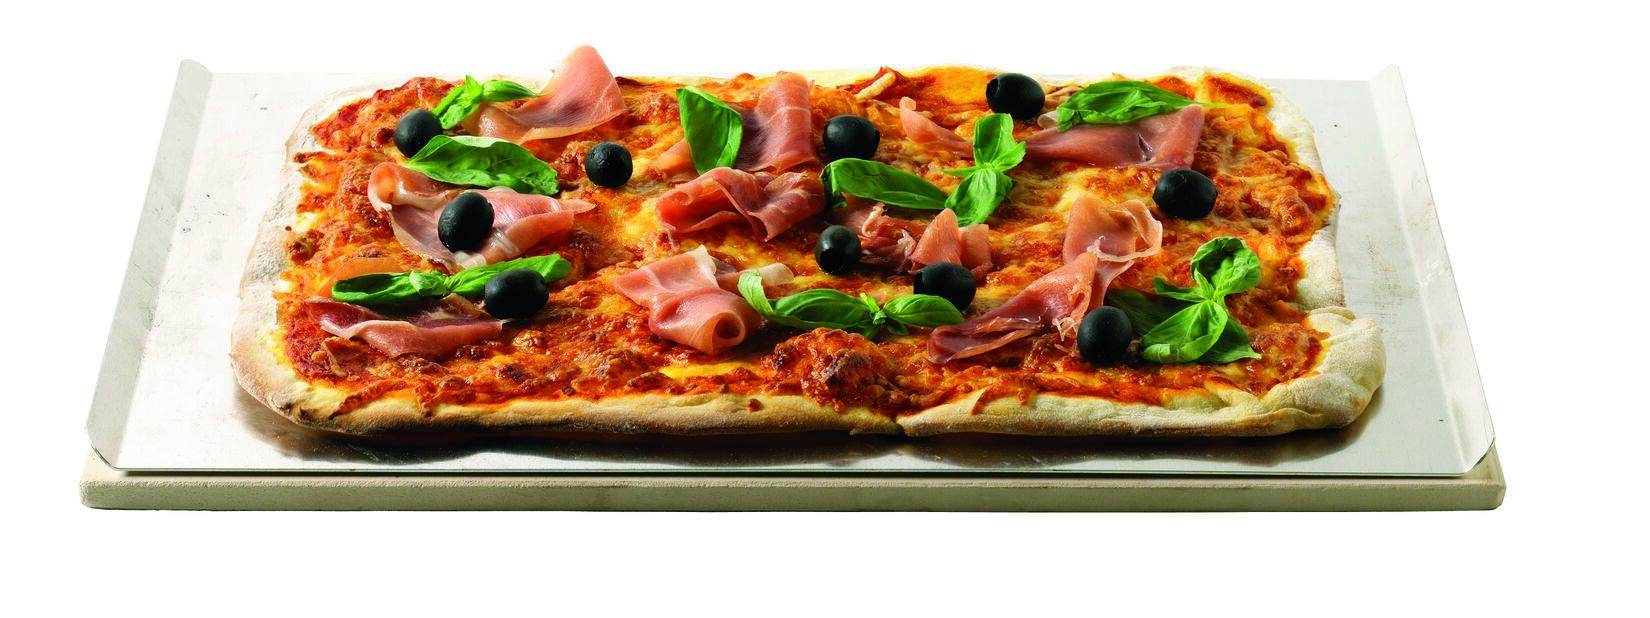 Pizzastein firkant